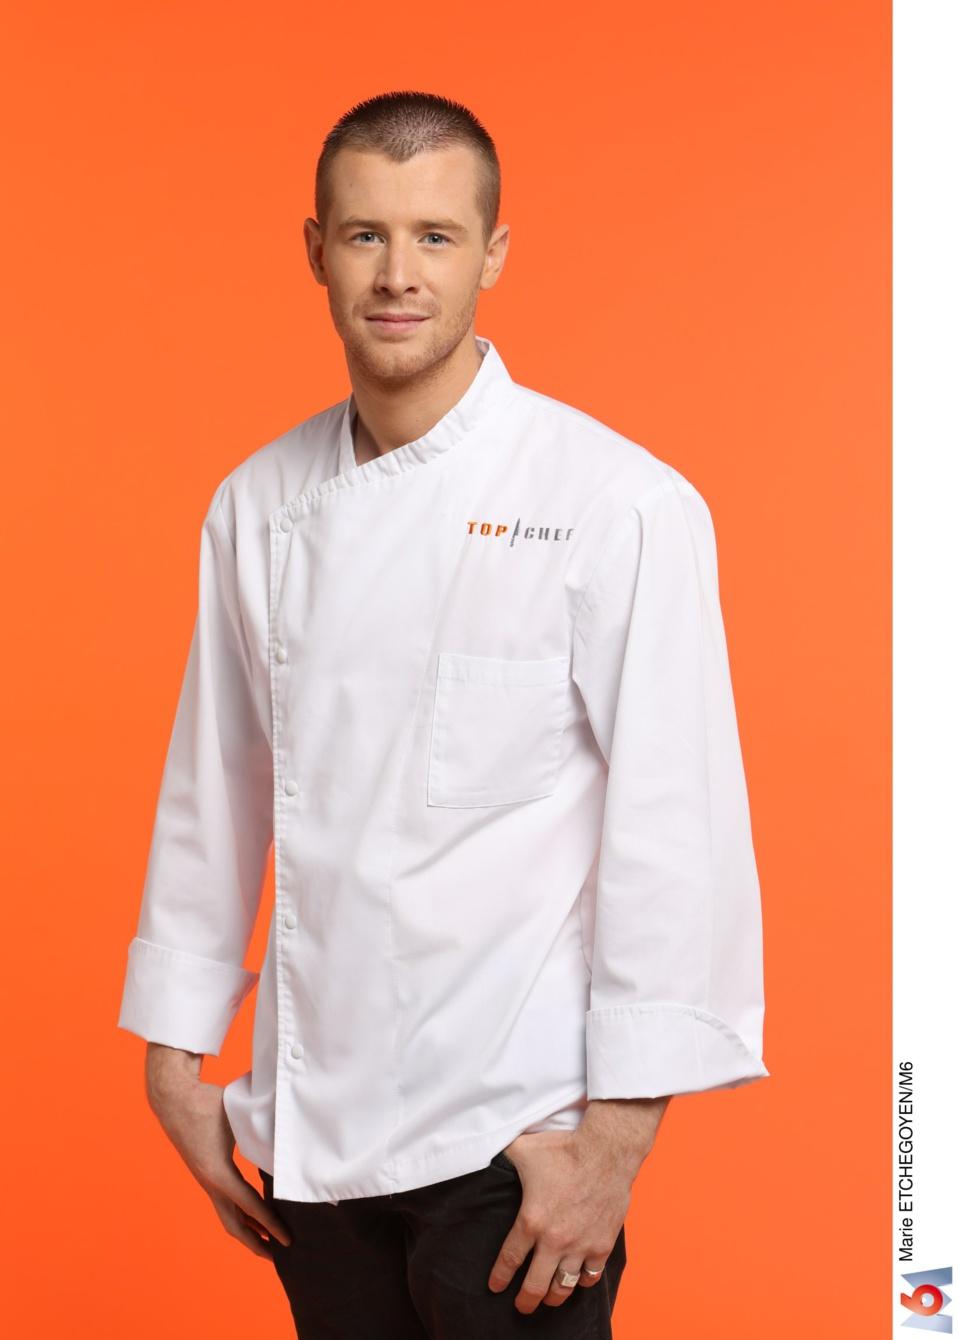 Top chef : Saison 8